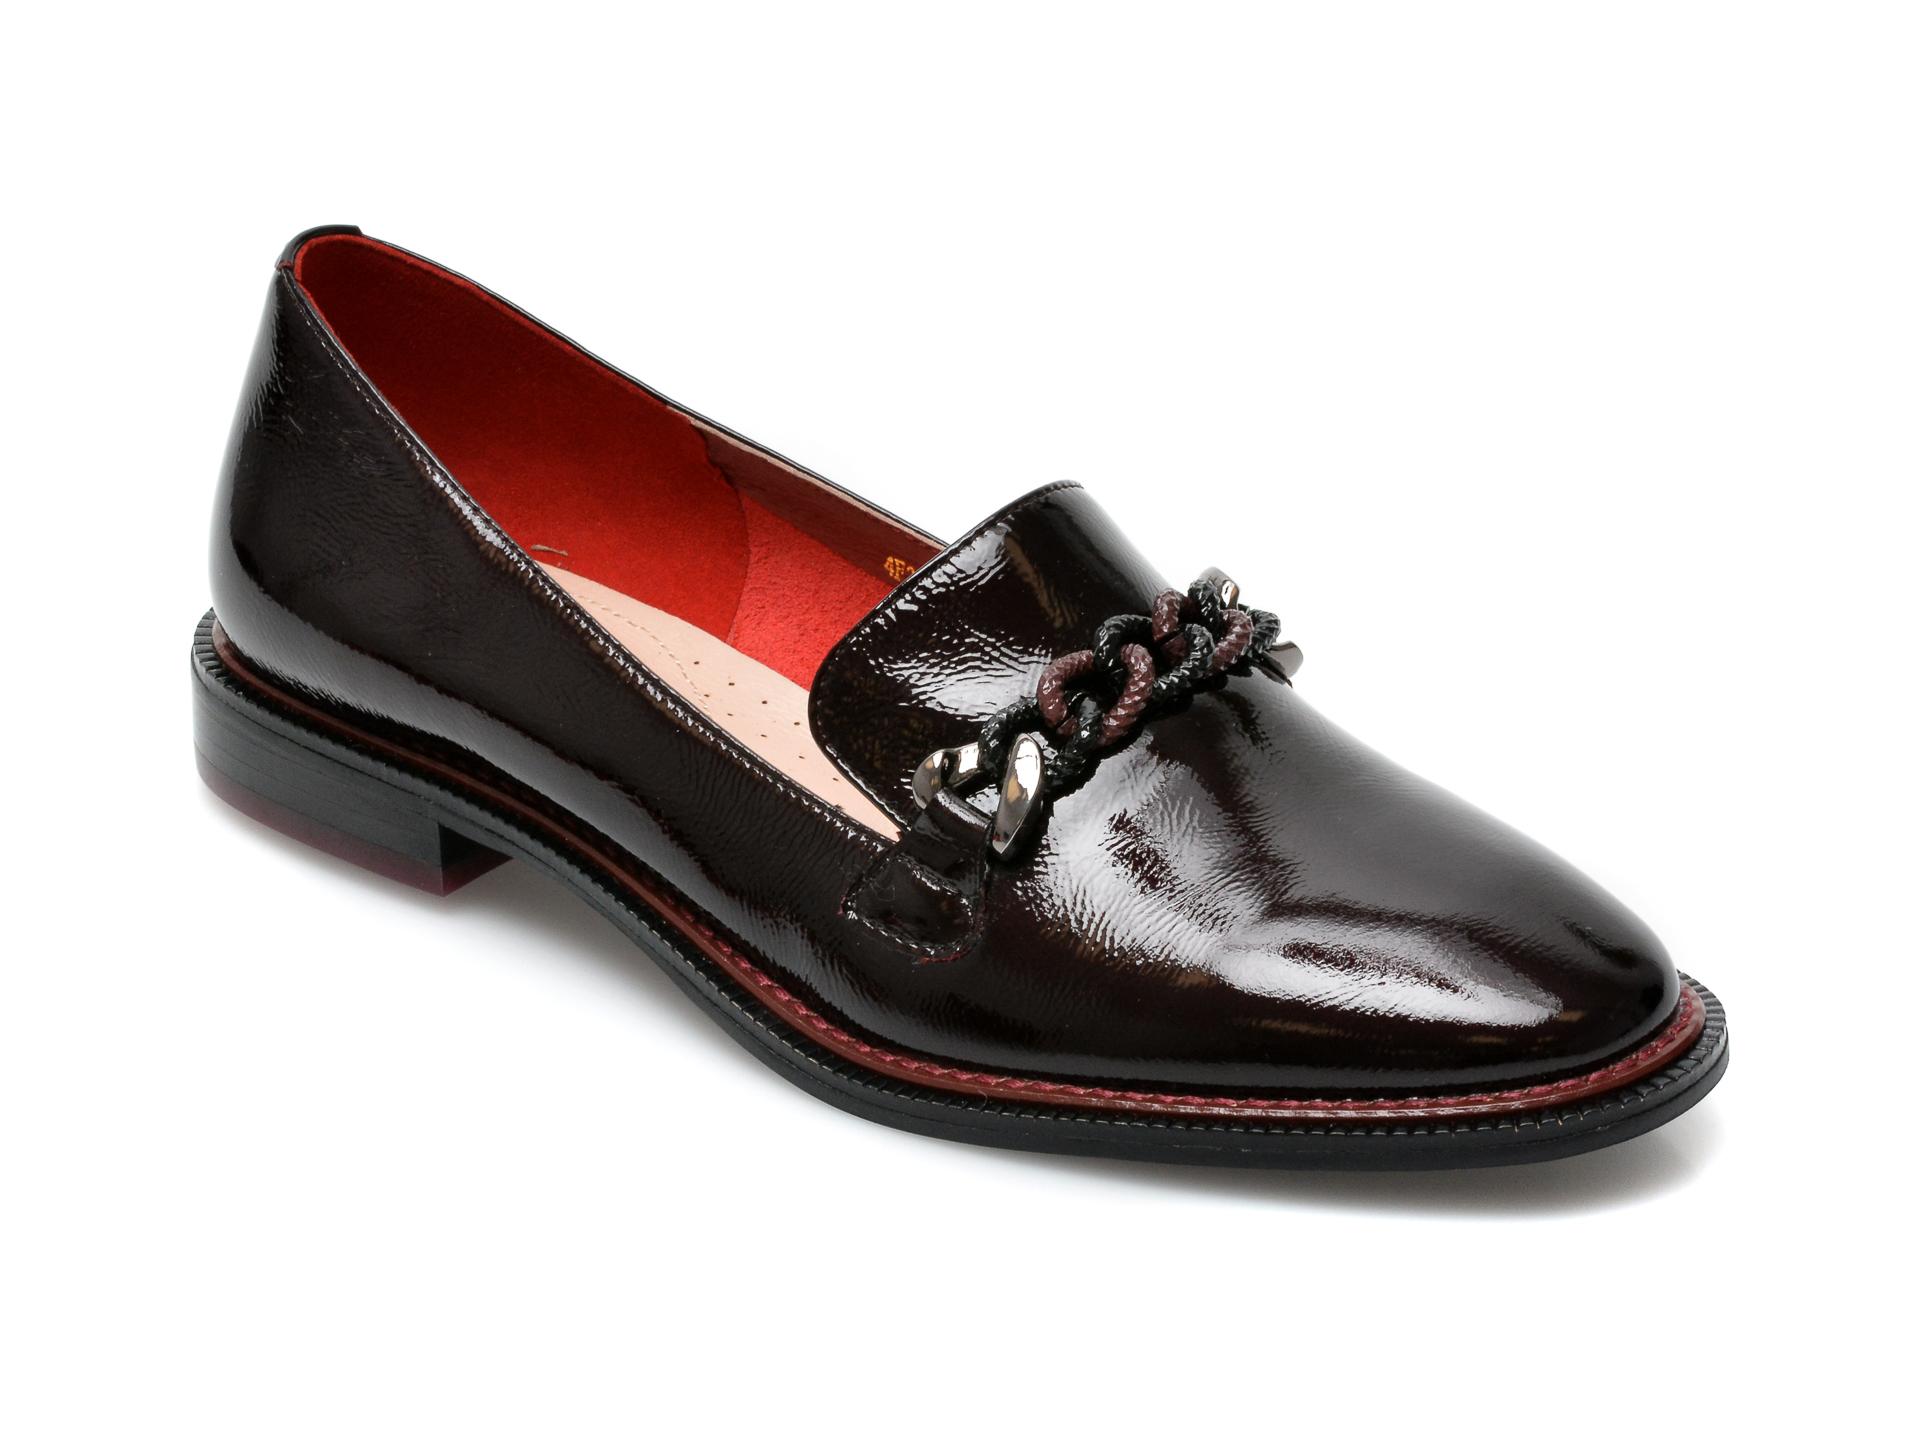 Pantofi EPICA visinii, 4F202A9, din piele naturala lacuita imagine otter.ro 2021